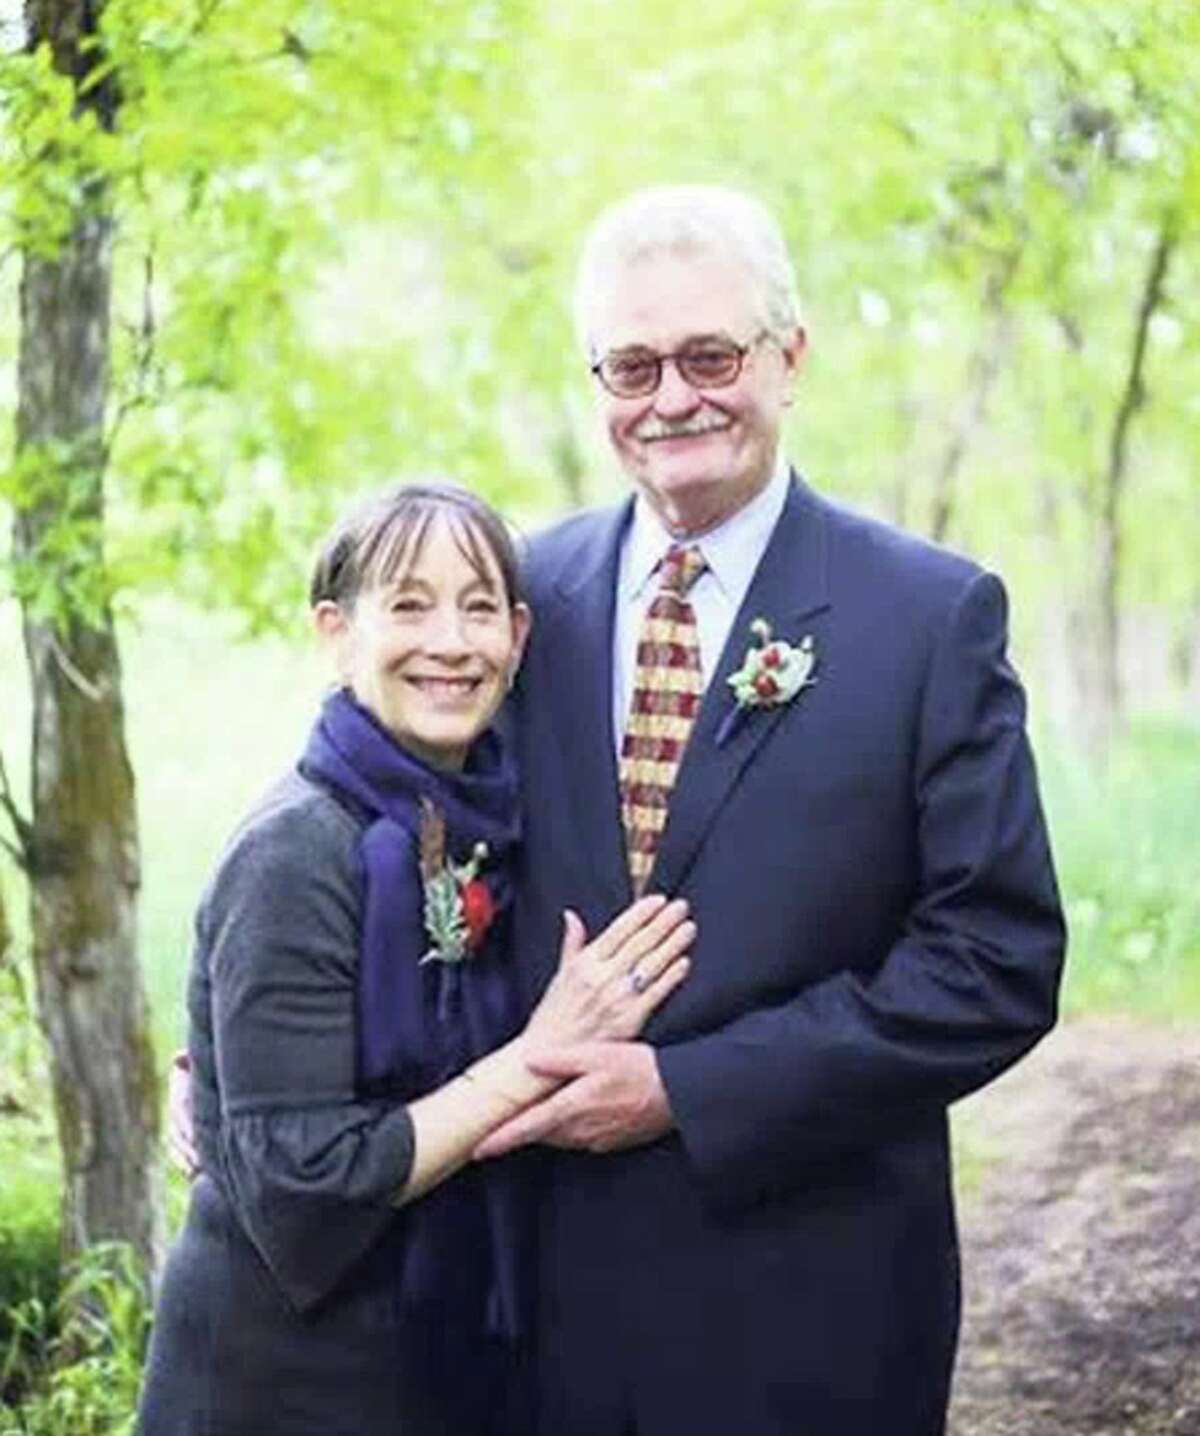 Carol and Bill Tamme of Darien